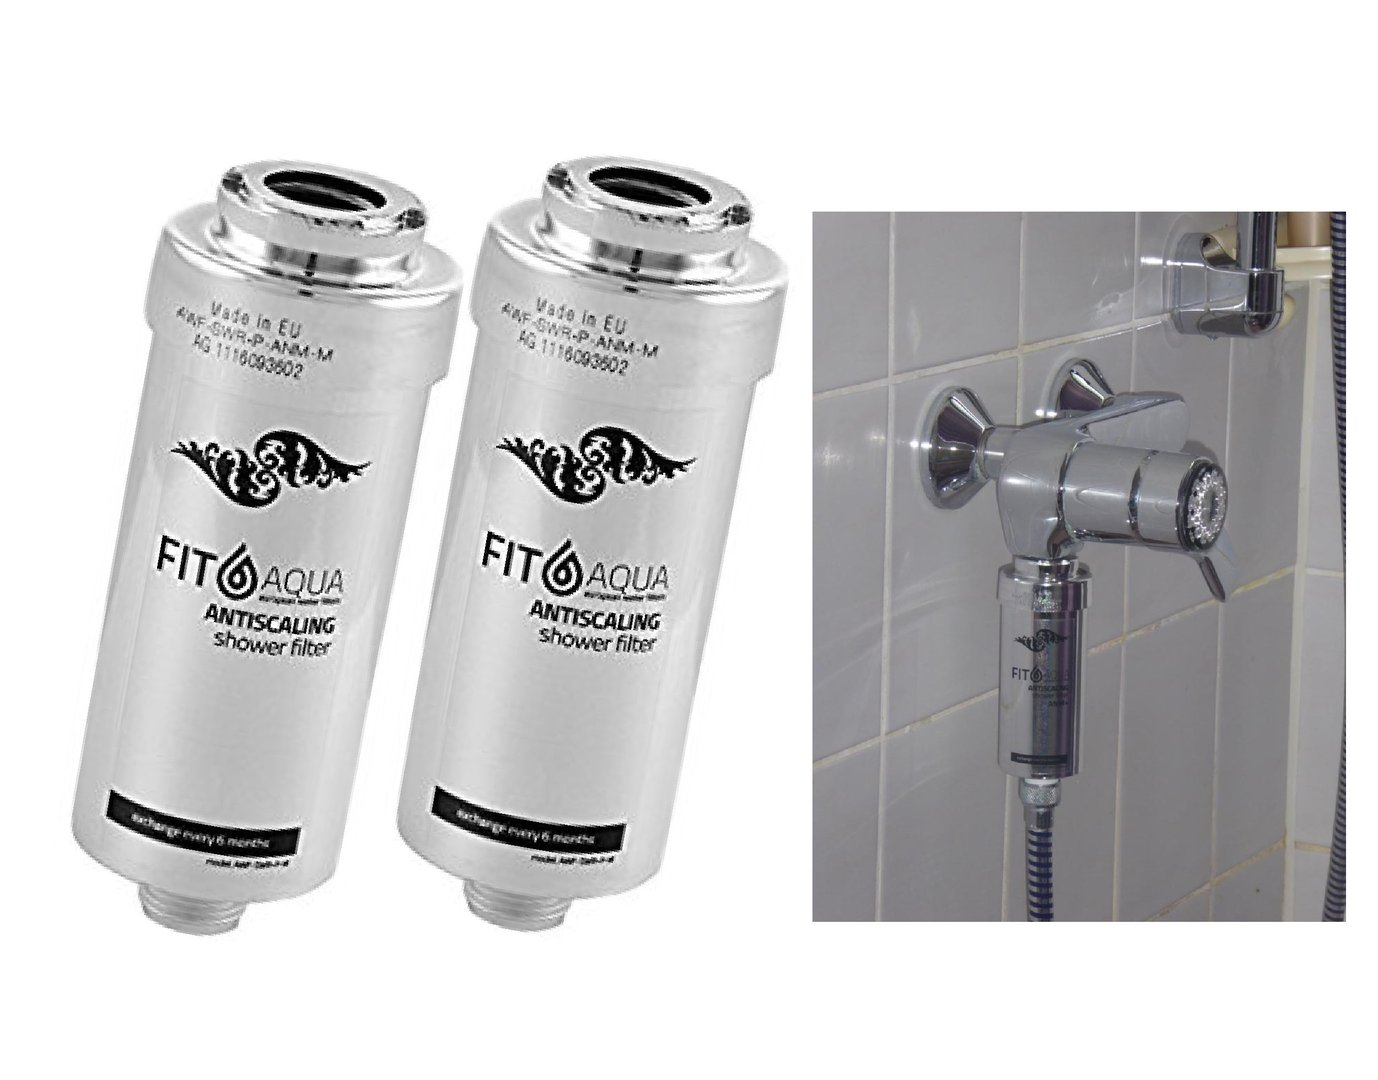 Gorenje Kühlschrank Filter : Duschfilter fitaqua antiscaling wasserfilter für dusche gegen